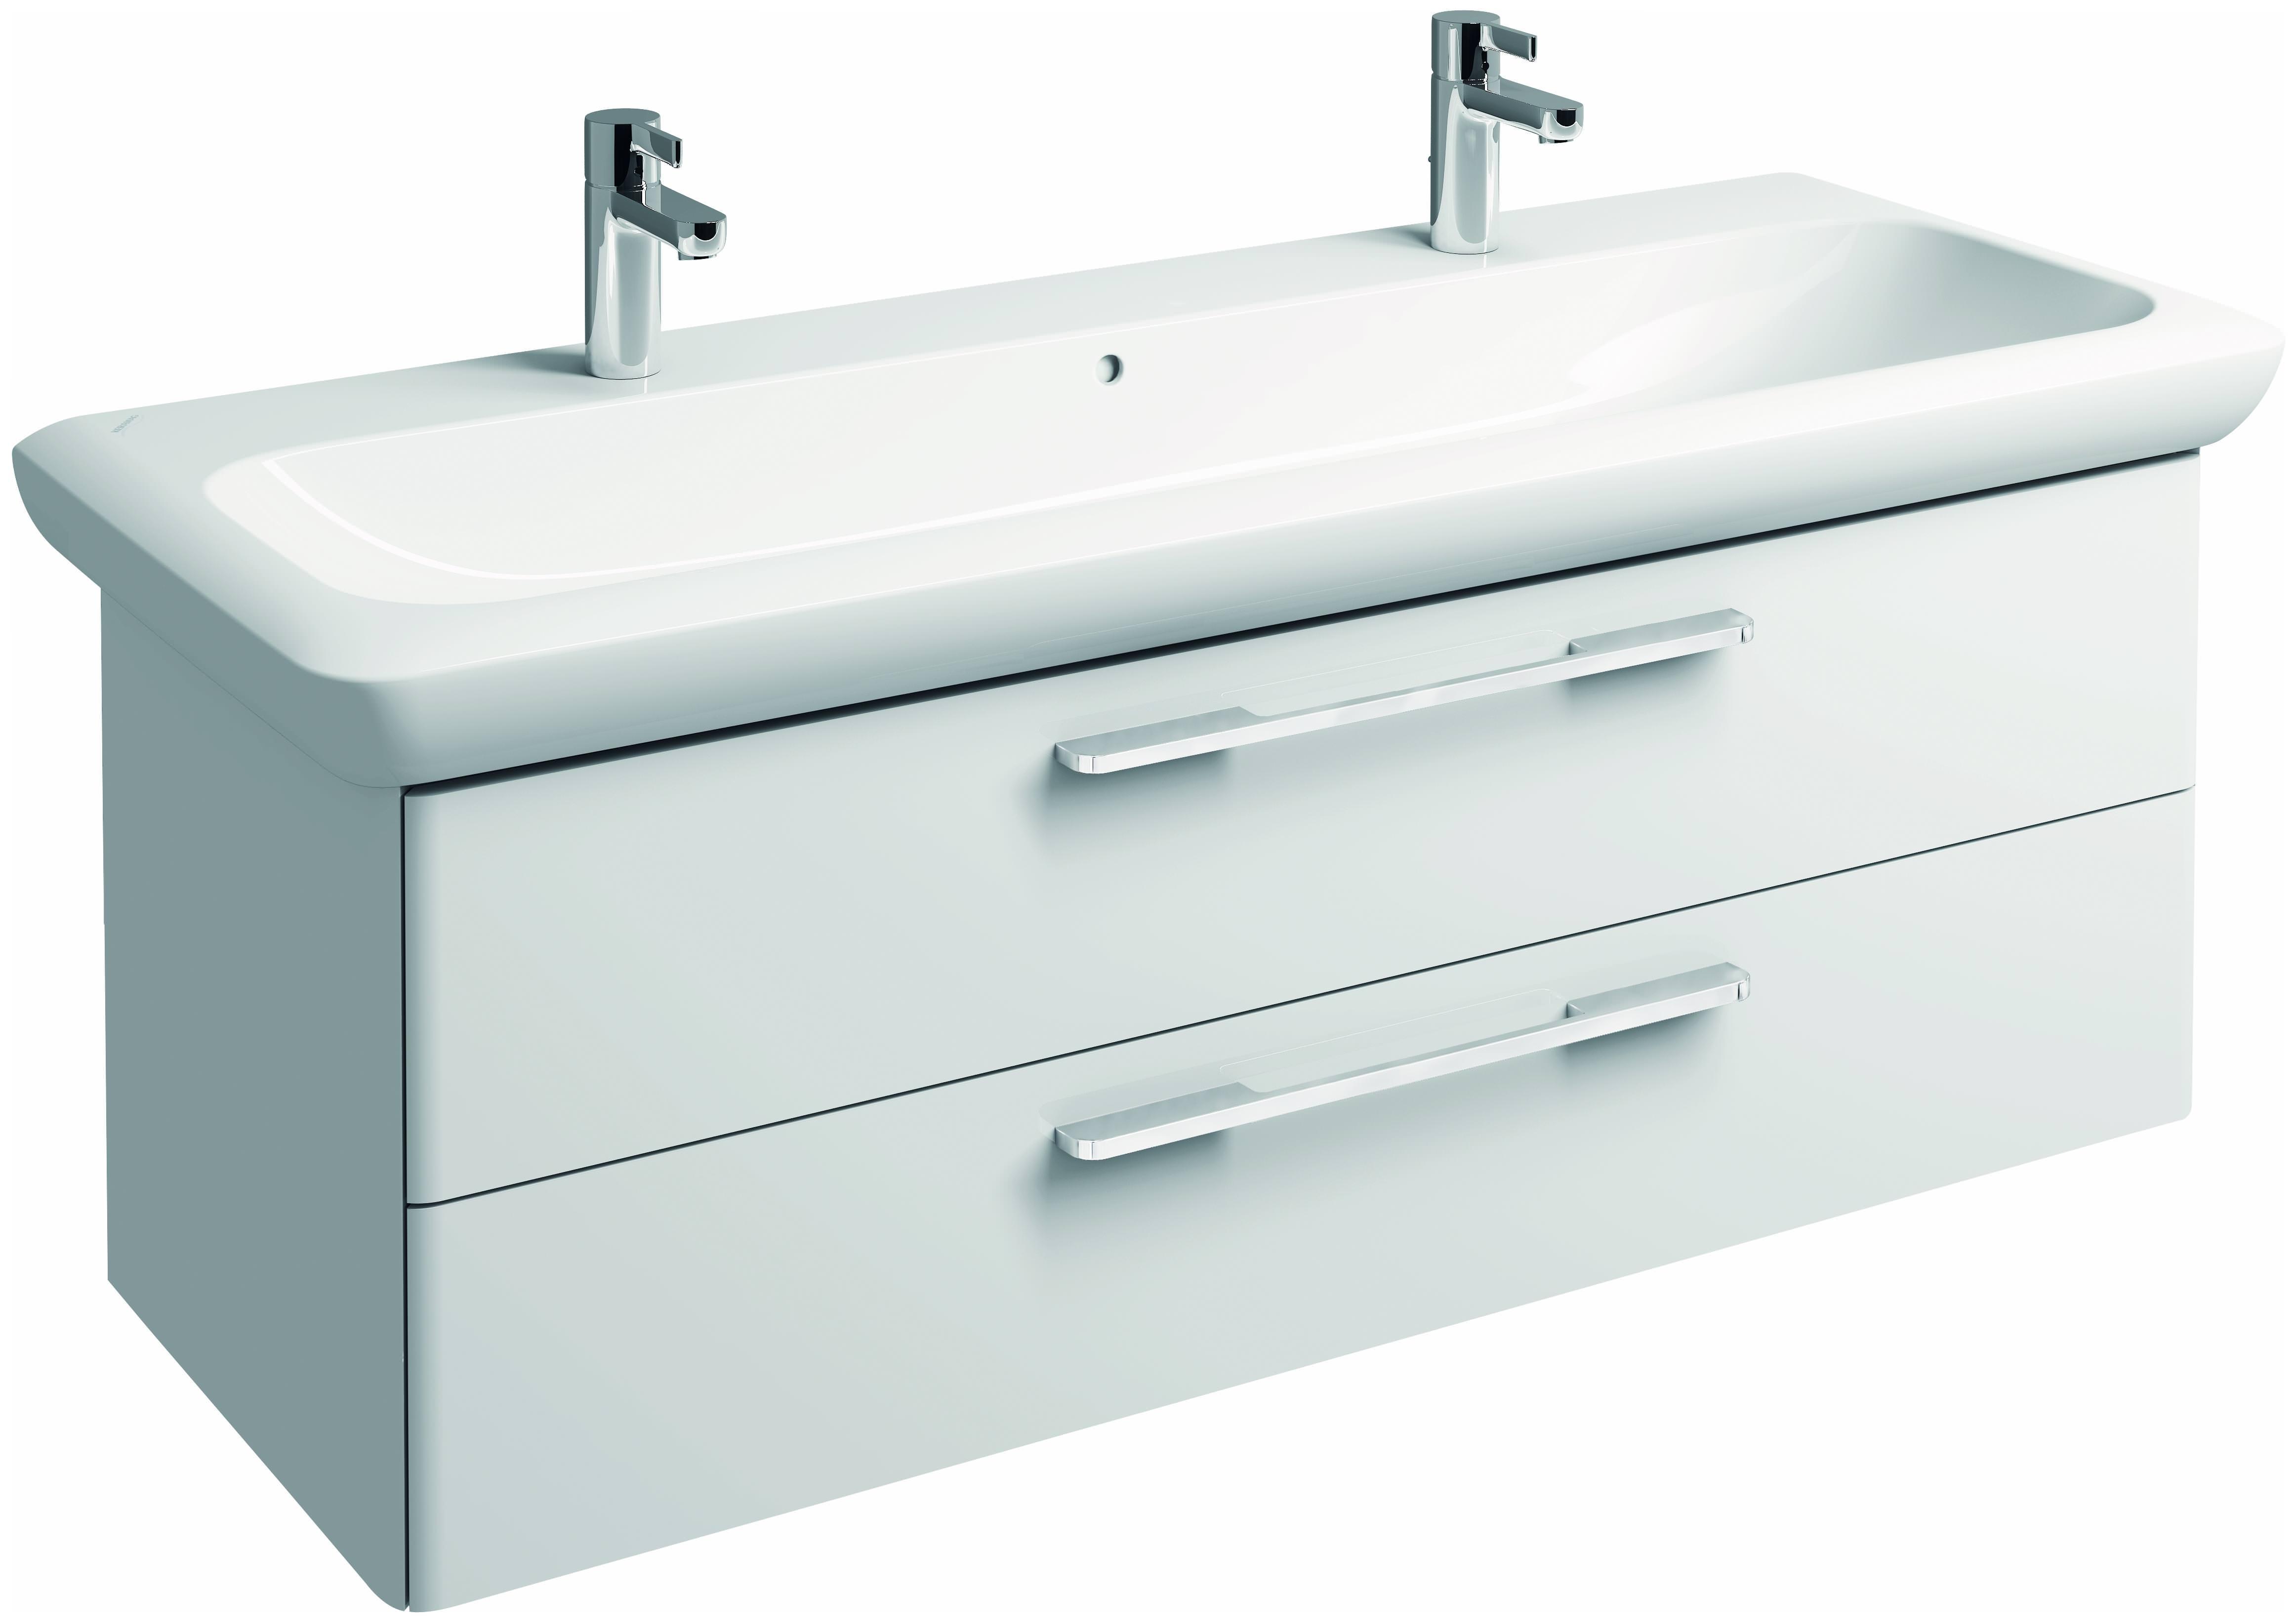 keramag it waschtischunterschrank 1200x427x434mm wei hochglanz 819130000. Black Bedroom Furniture Sets. Home Design Ideas